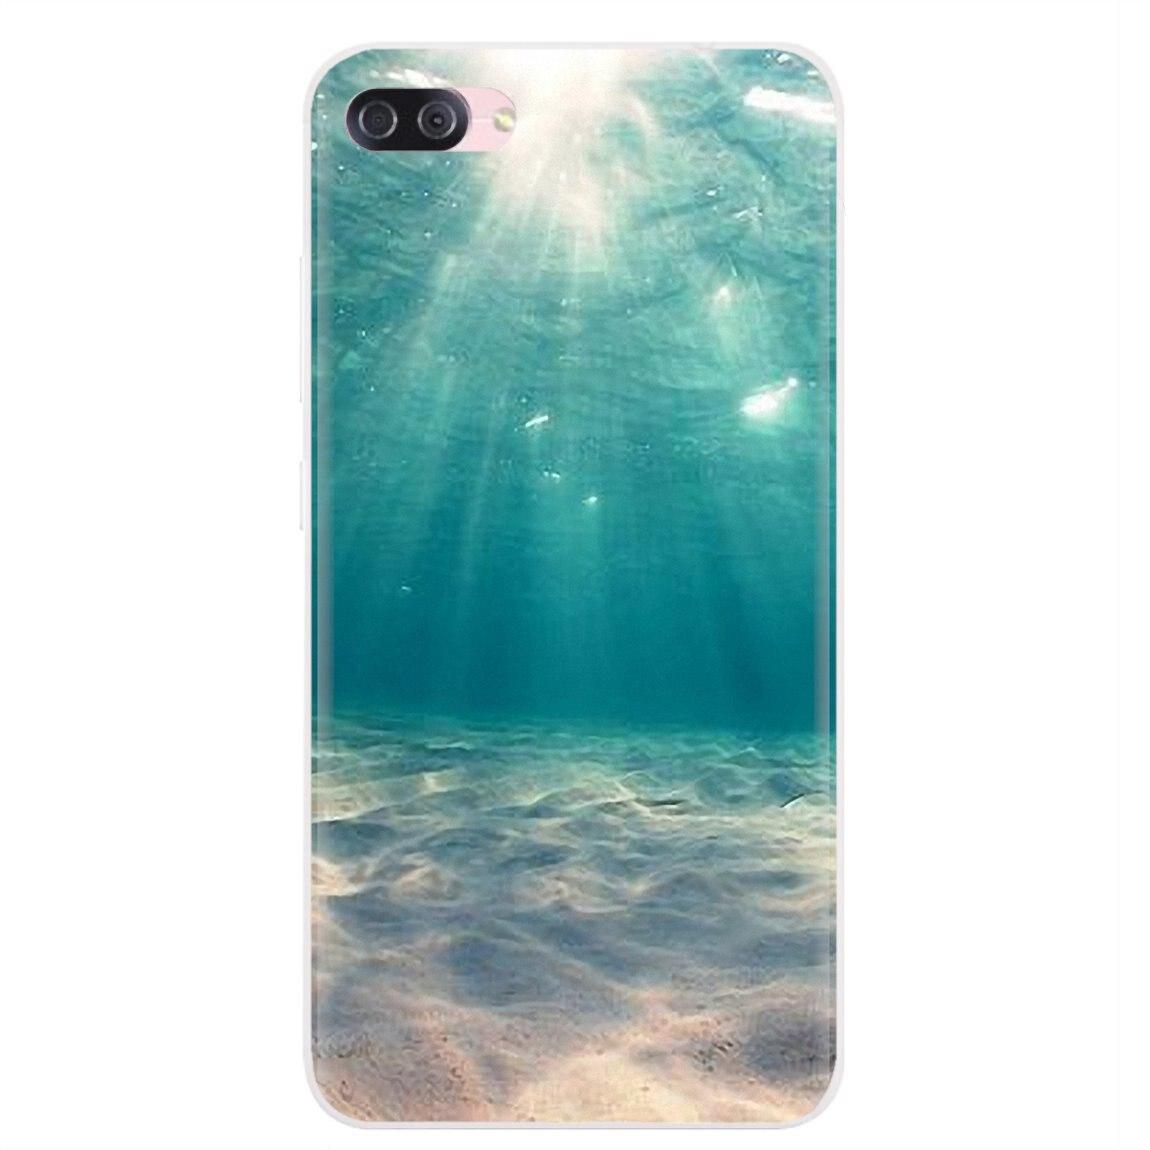 Capa de silicone para iphone 11 pro 4 4S 5 5S se 5c 6s 7 8 x xr xs plus max para ipod touch verão praia sol estrela do mar surf meninas